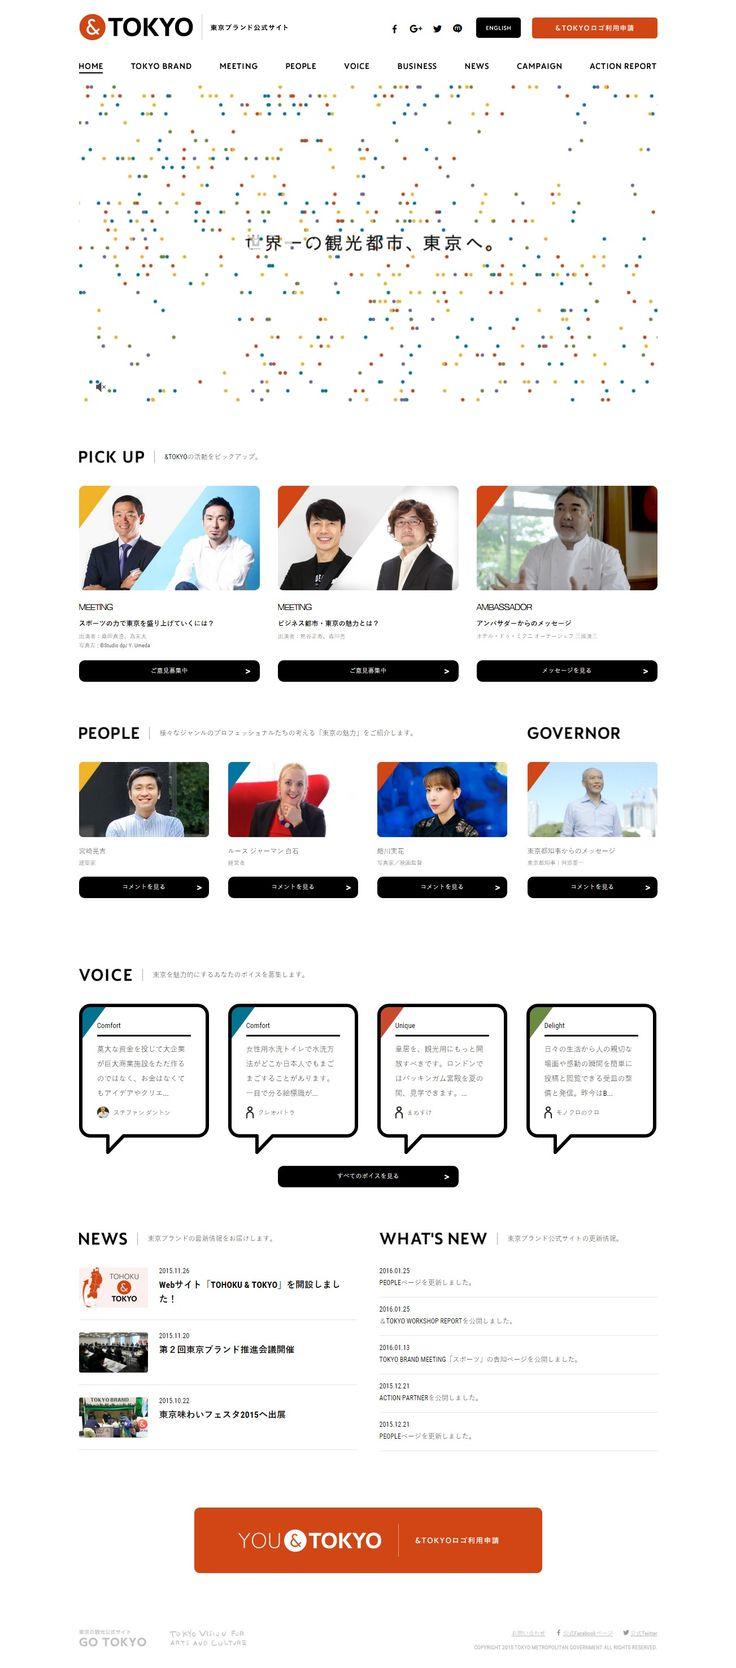 toppage / #行政 / イラスト / フラット /  ゴシック / 直線 / 白 / 赤 / 黒 / モノトーン / 動画 / ブログ / 声 / お知らせ / トップページ / シンプルフッター